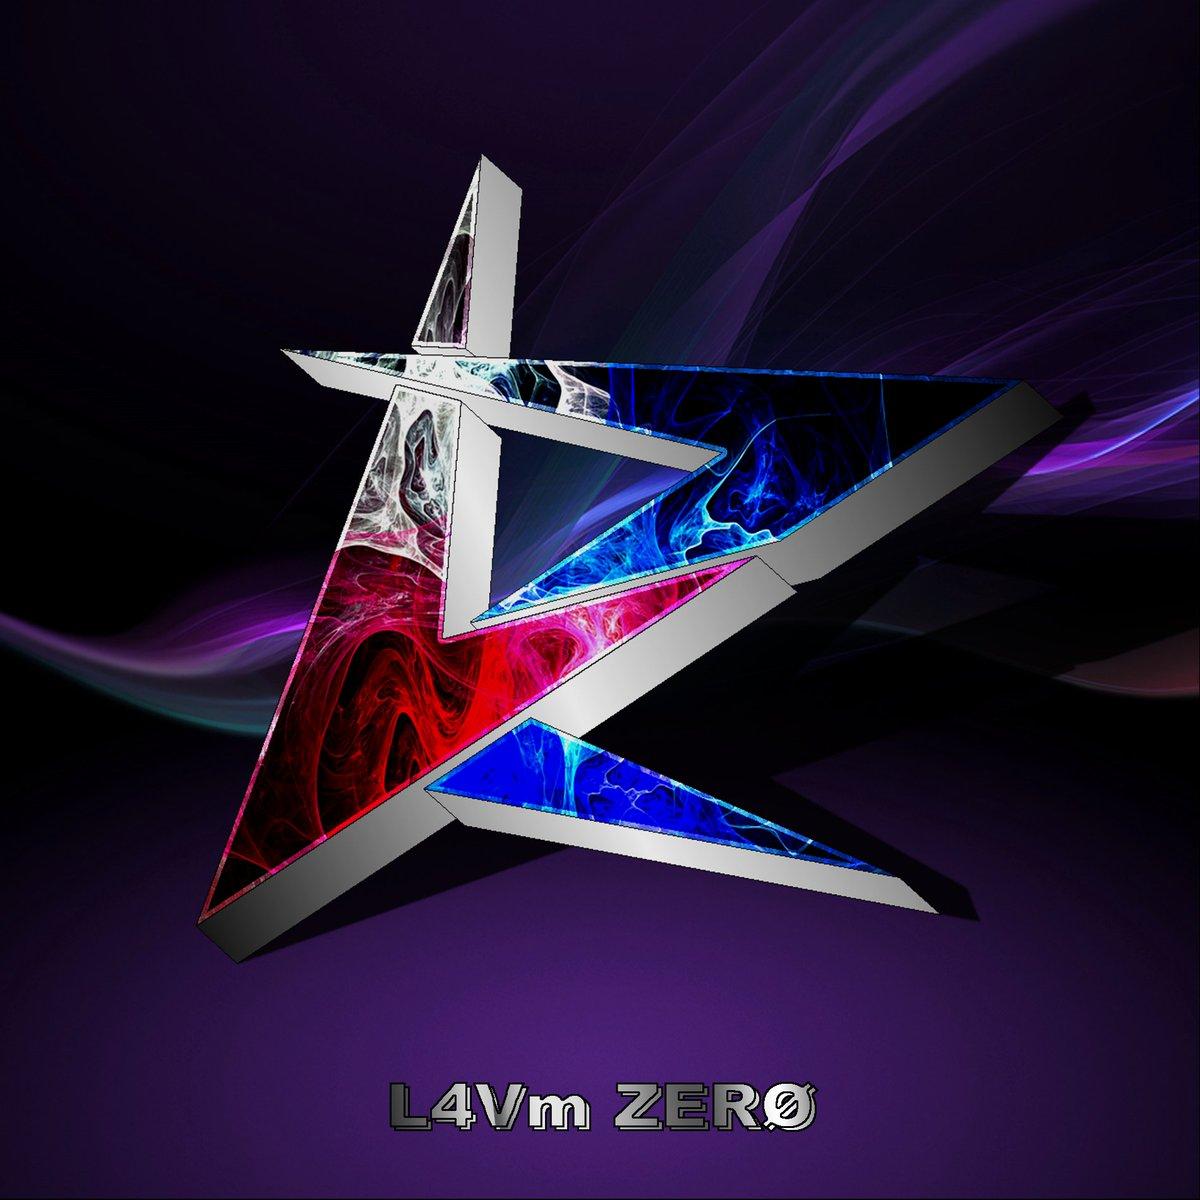 L4Vm ZERØ クランロゴ&アイコン完成しました。